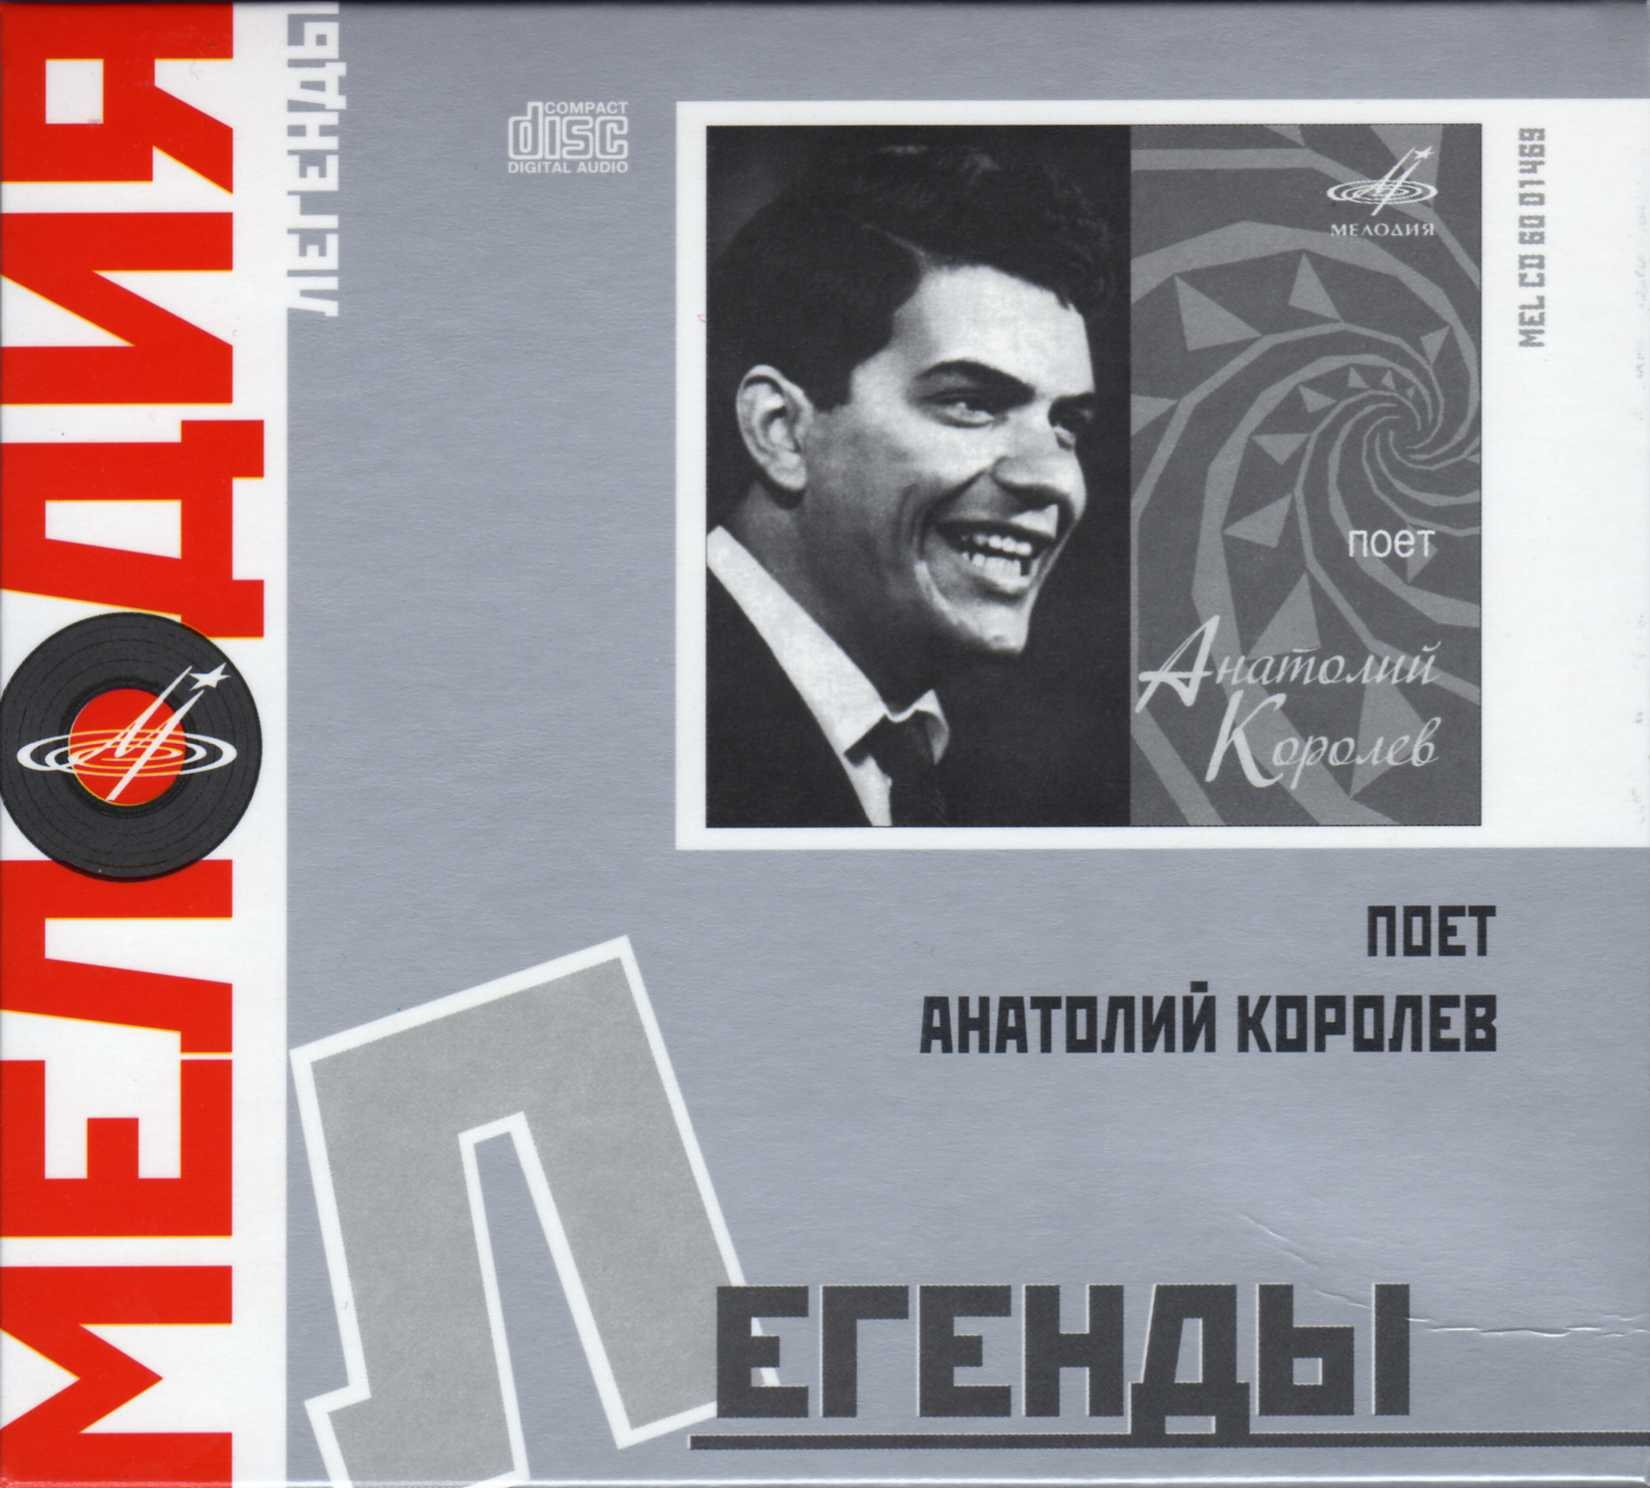 russkie-ispolniteli-pop-muziki